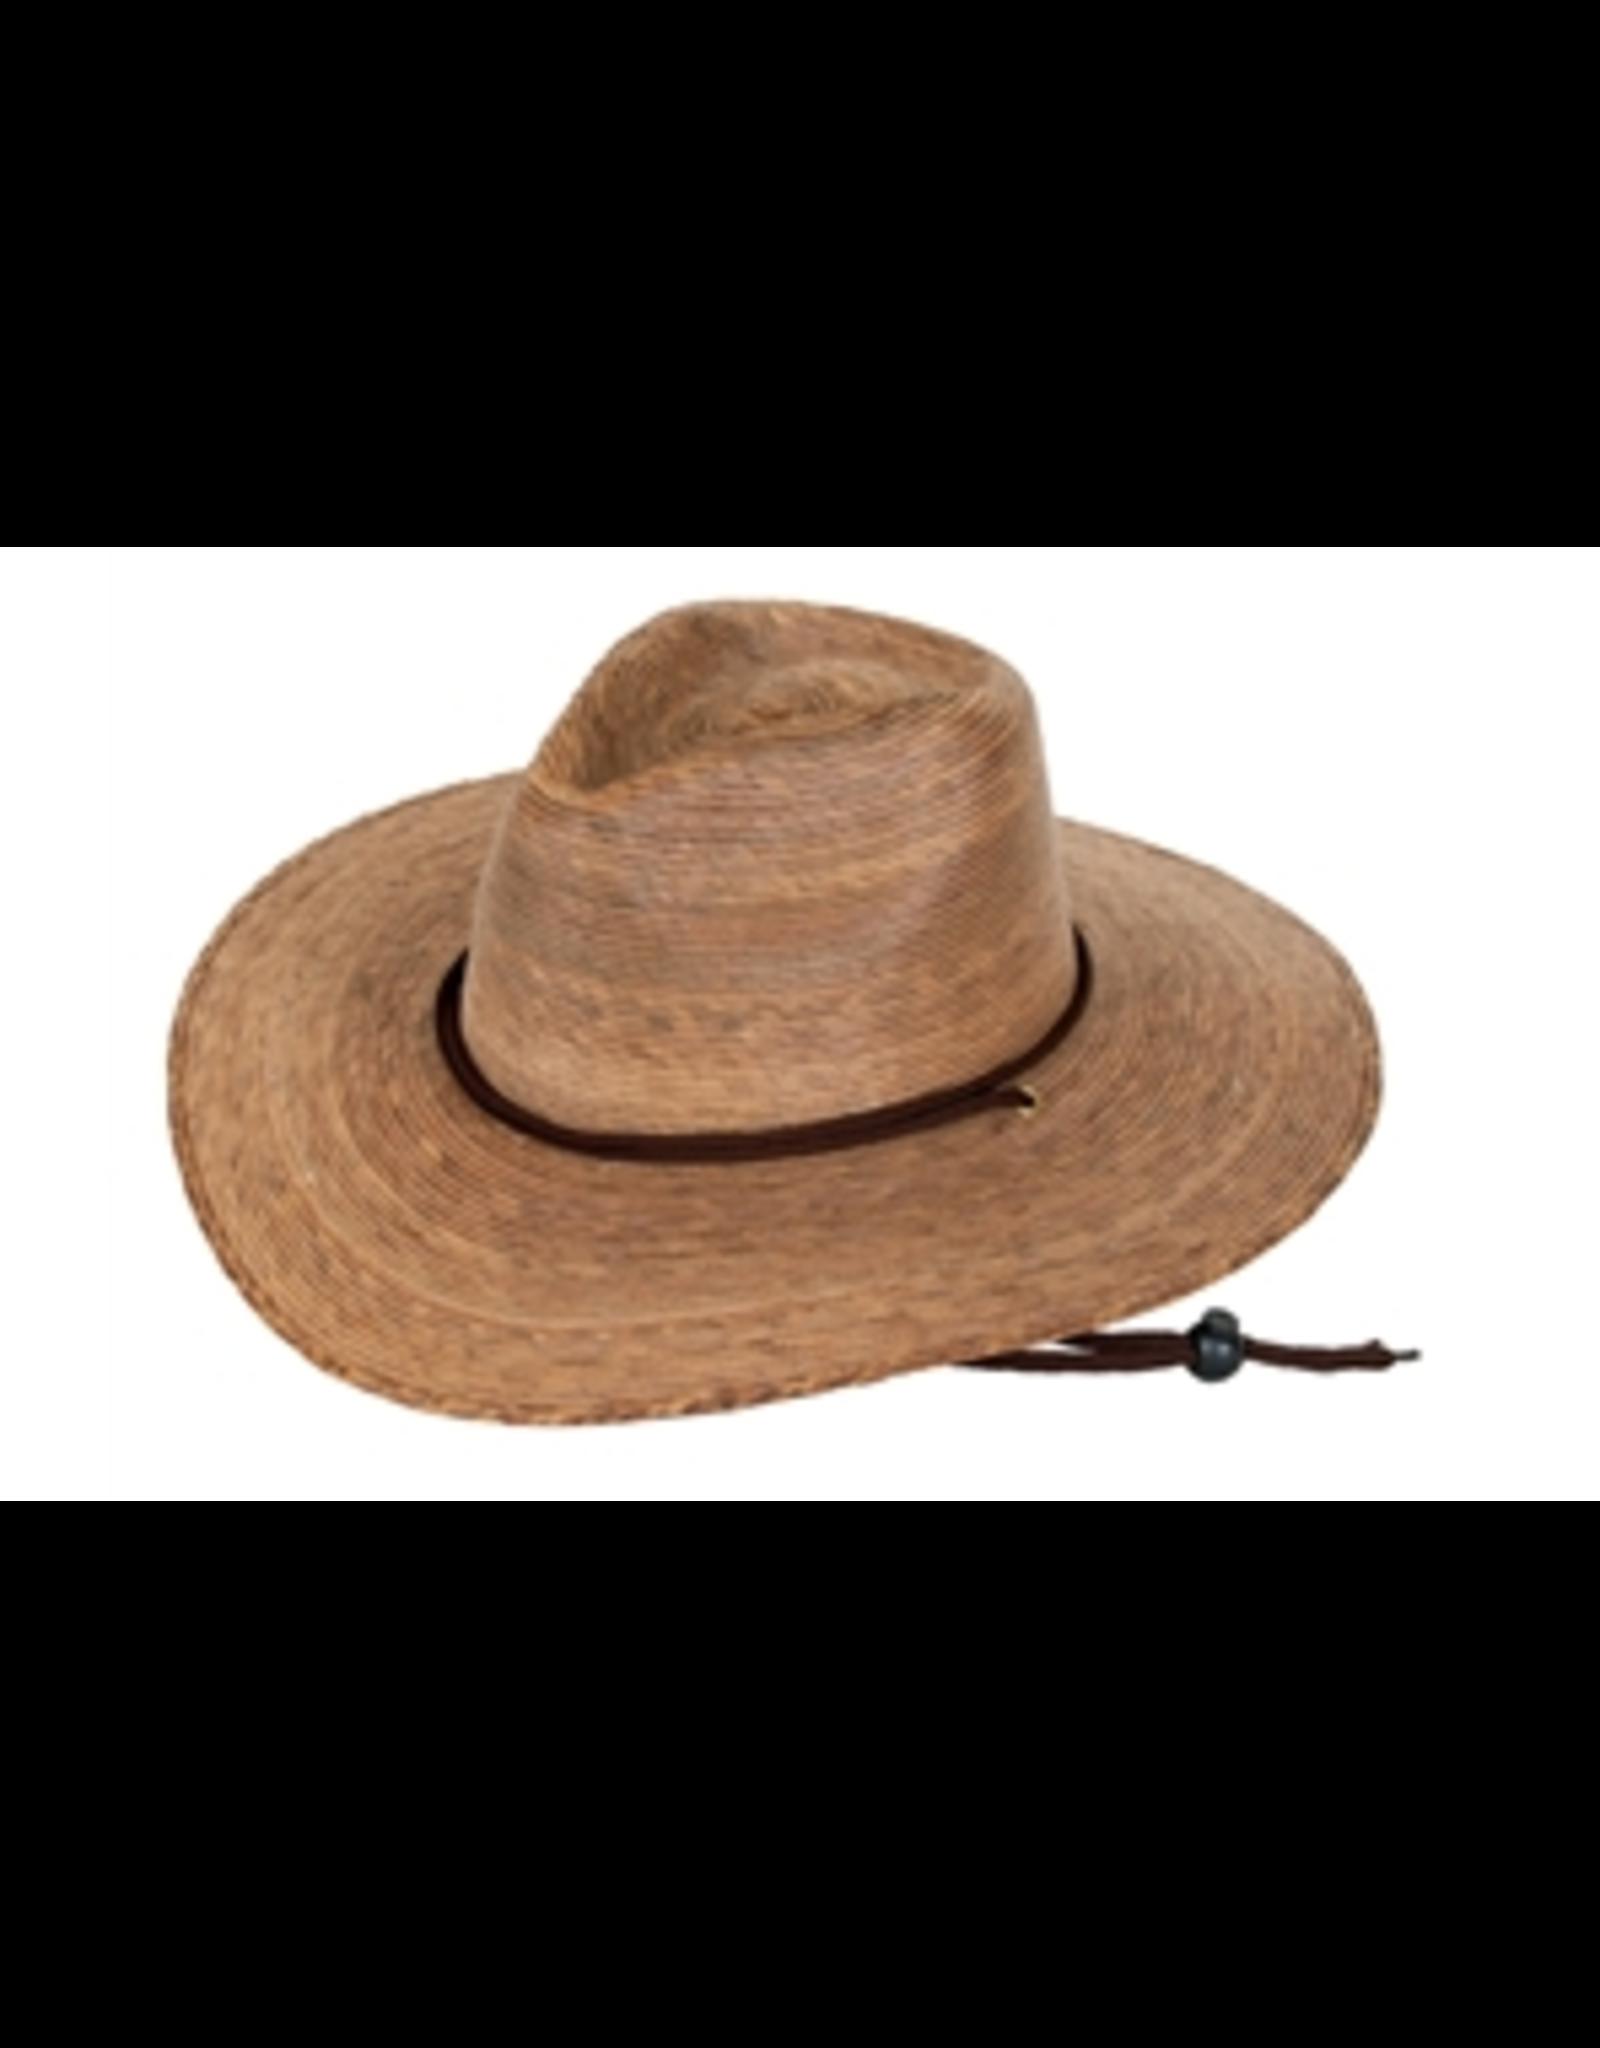 Tula Hats, Gardener, Mexico